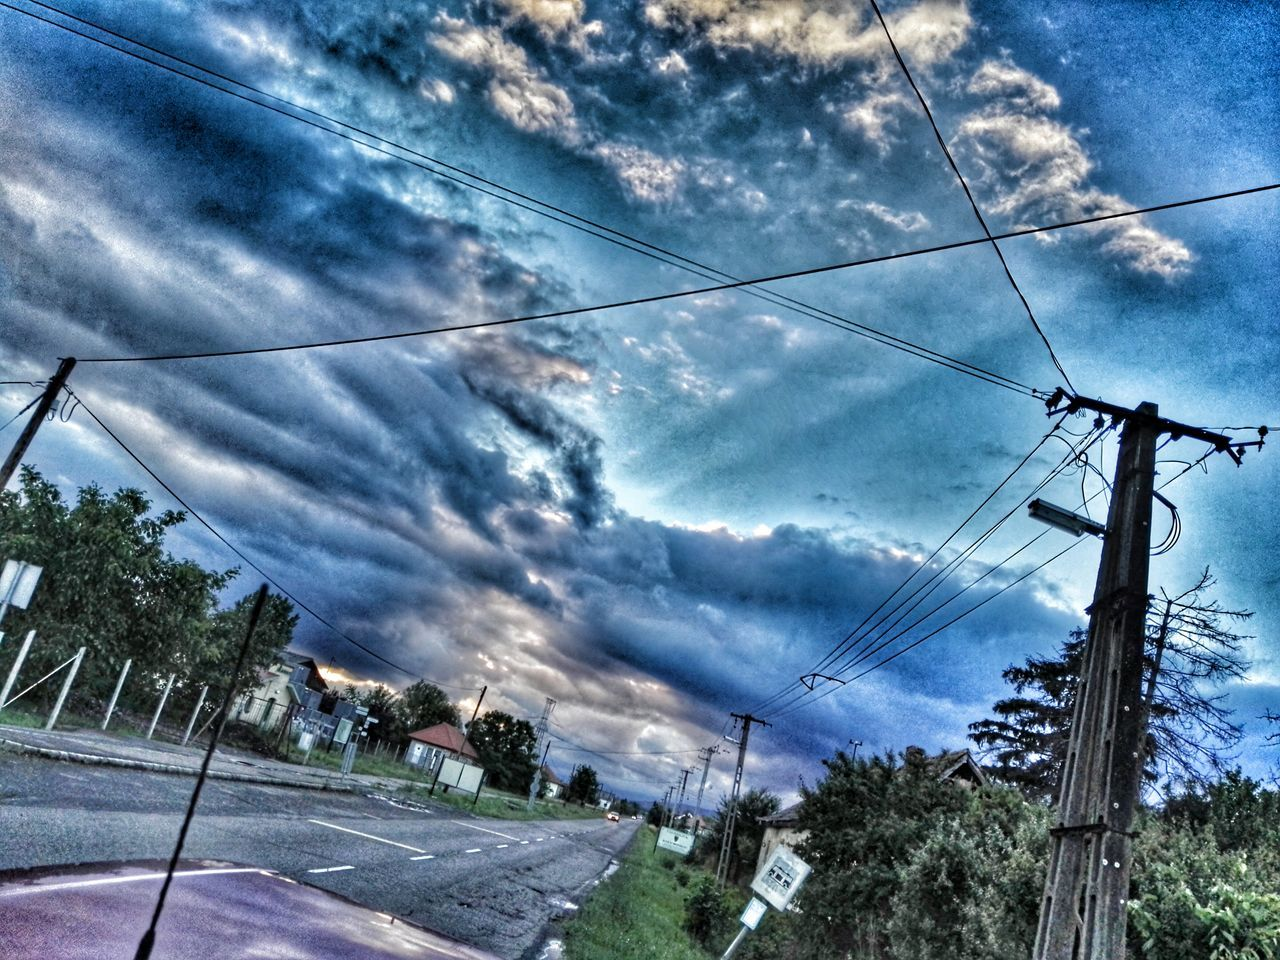 Cloud and sky, sunshine, road